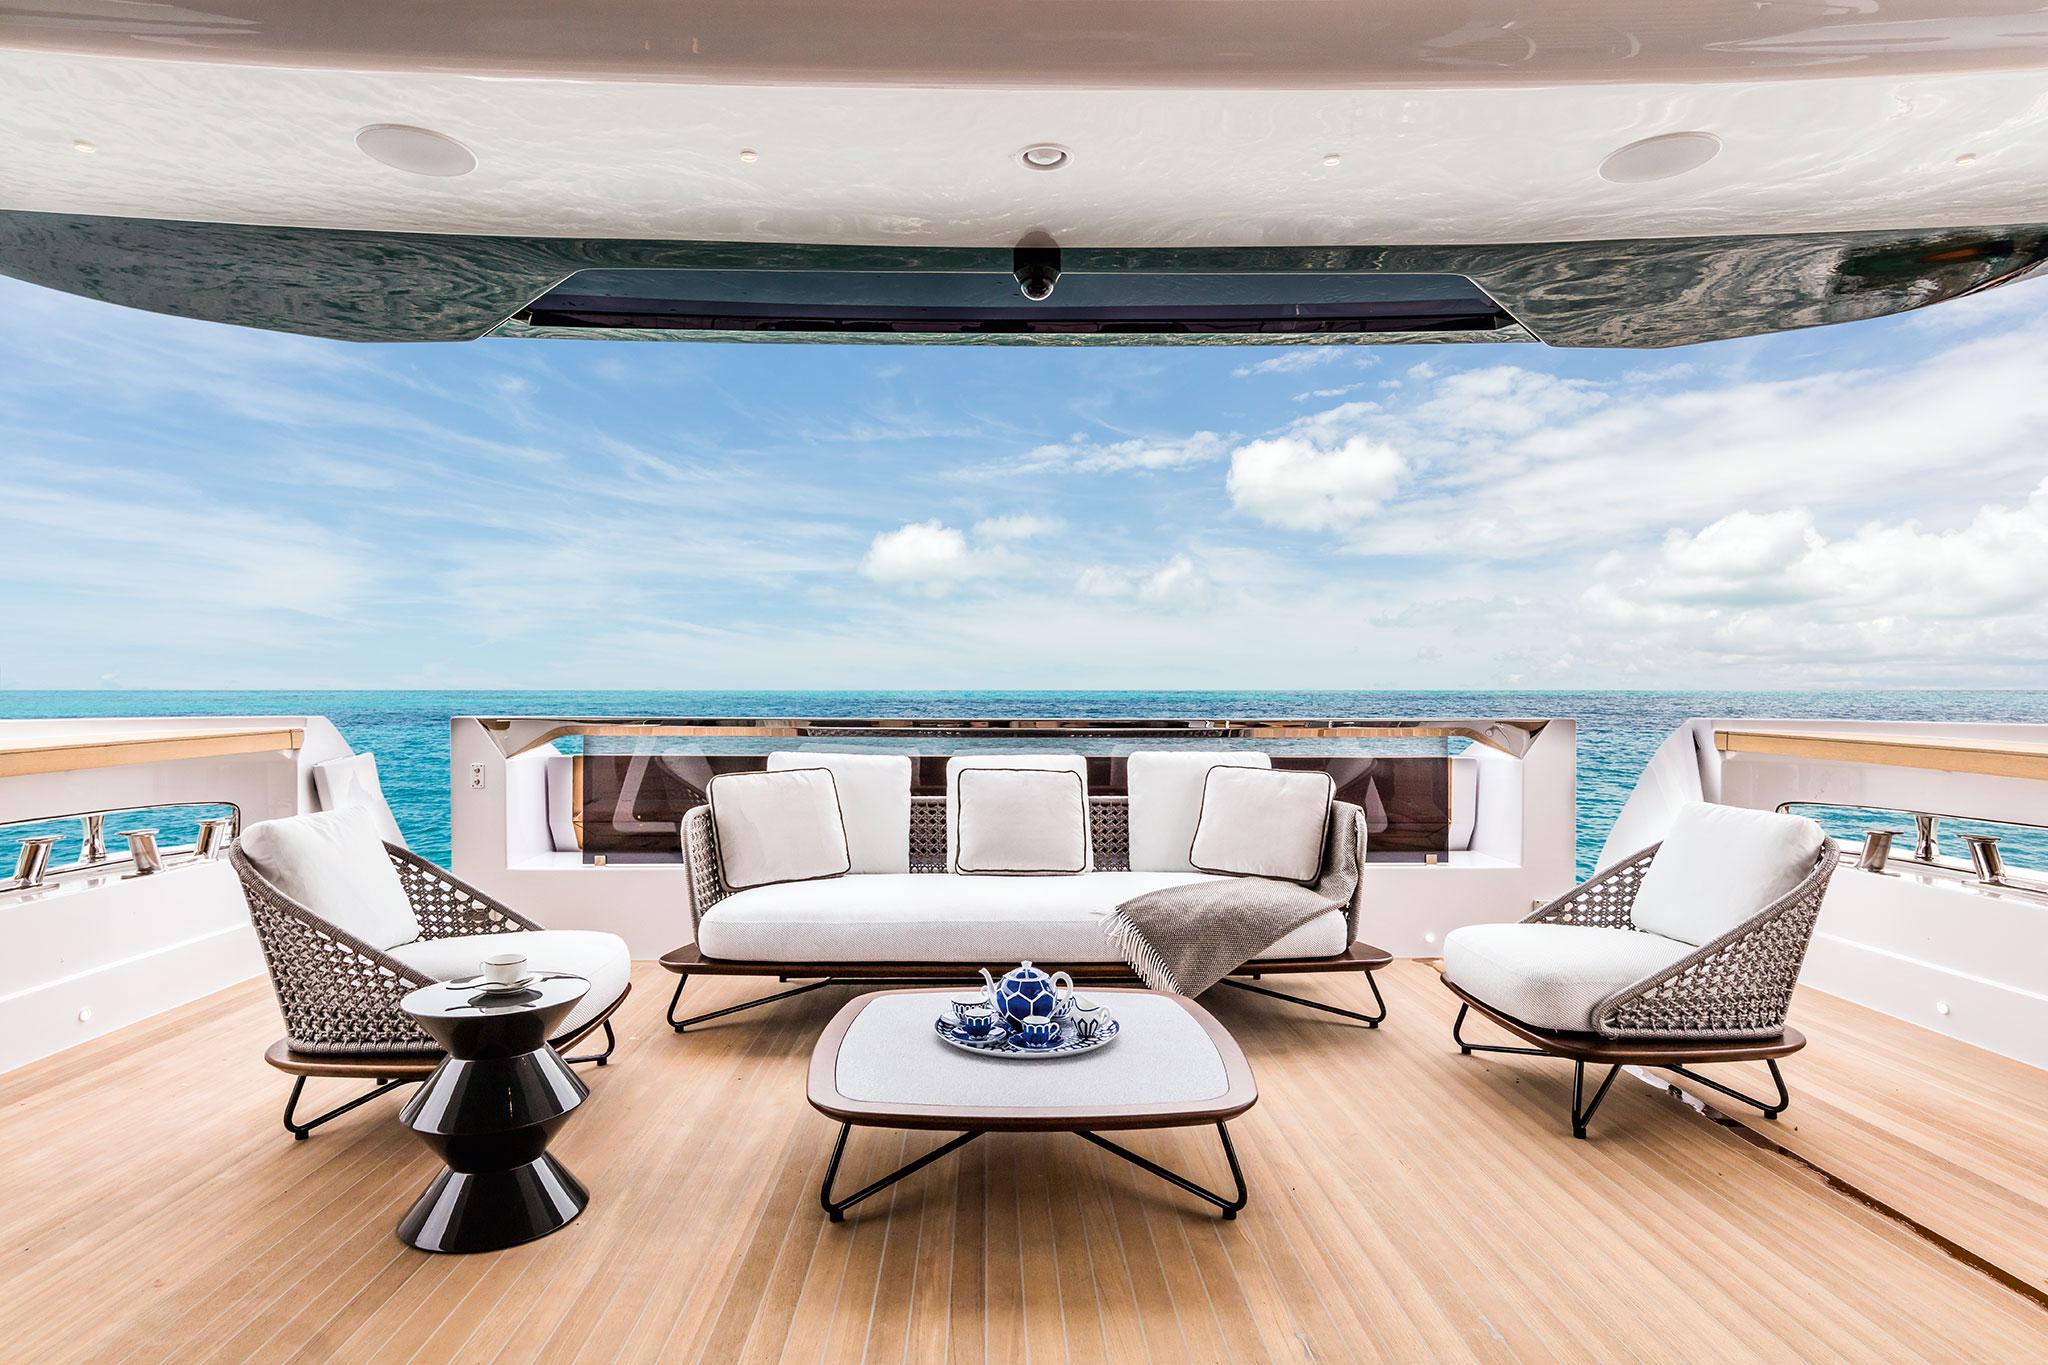 essai-Custom-line-120-yachts-france-170-06-336-corr3